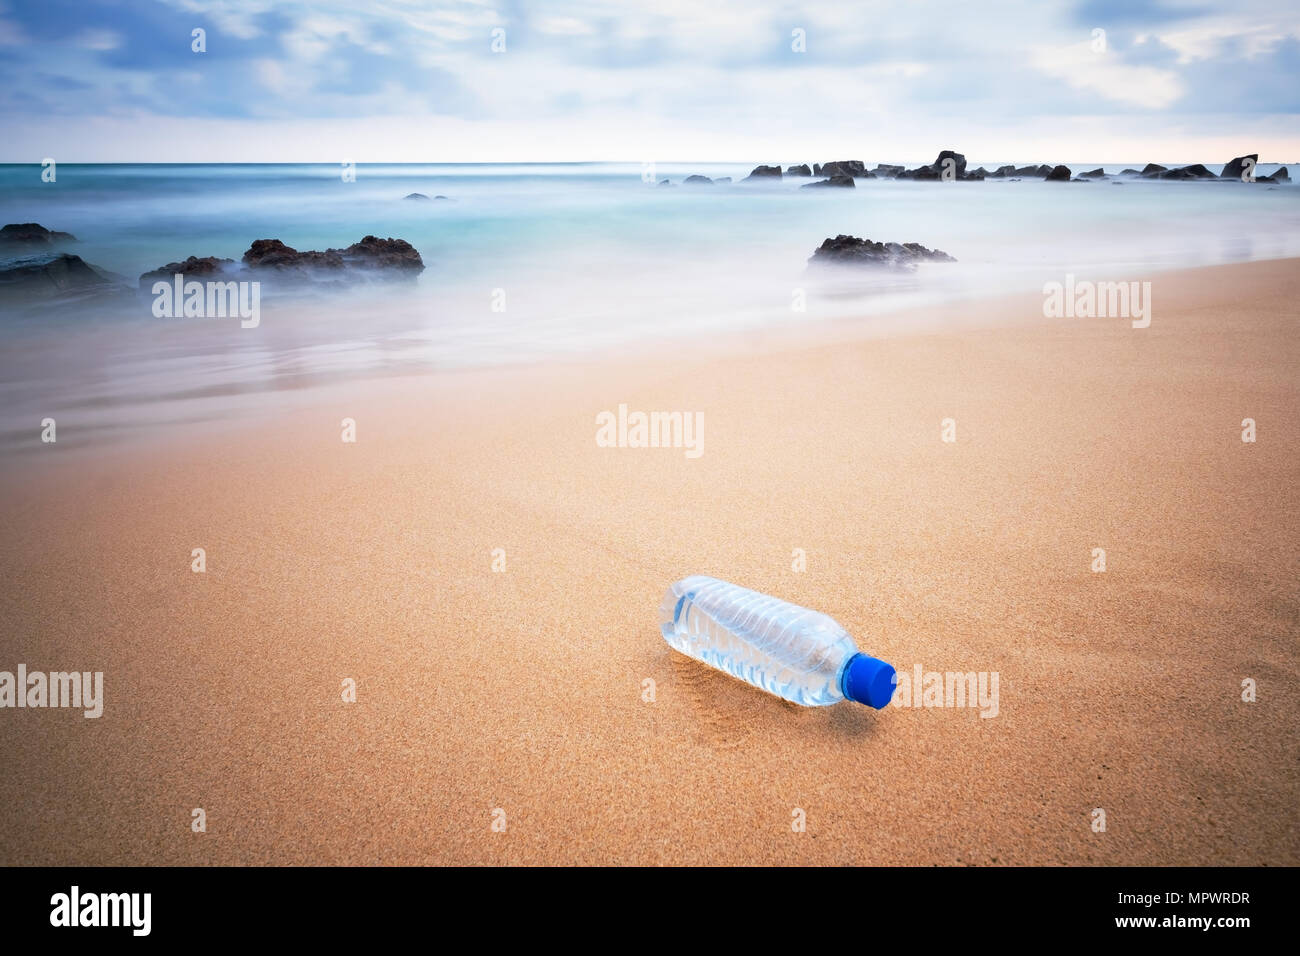 Plastic bottle on the beach. - Stock Image